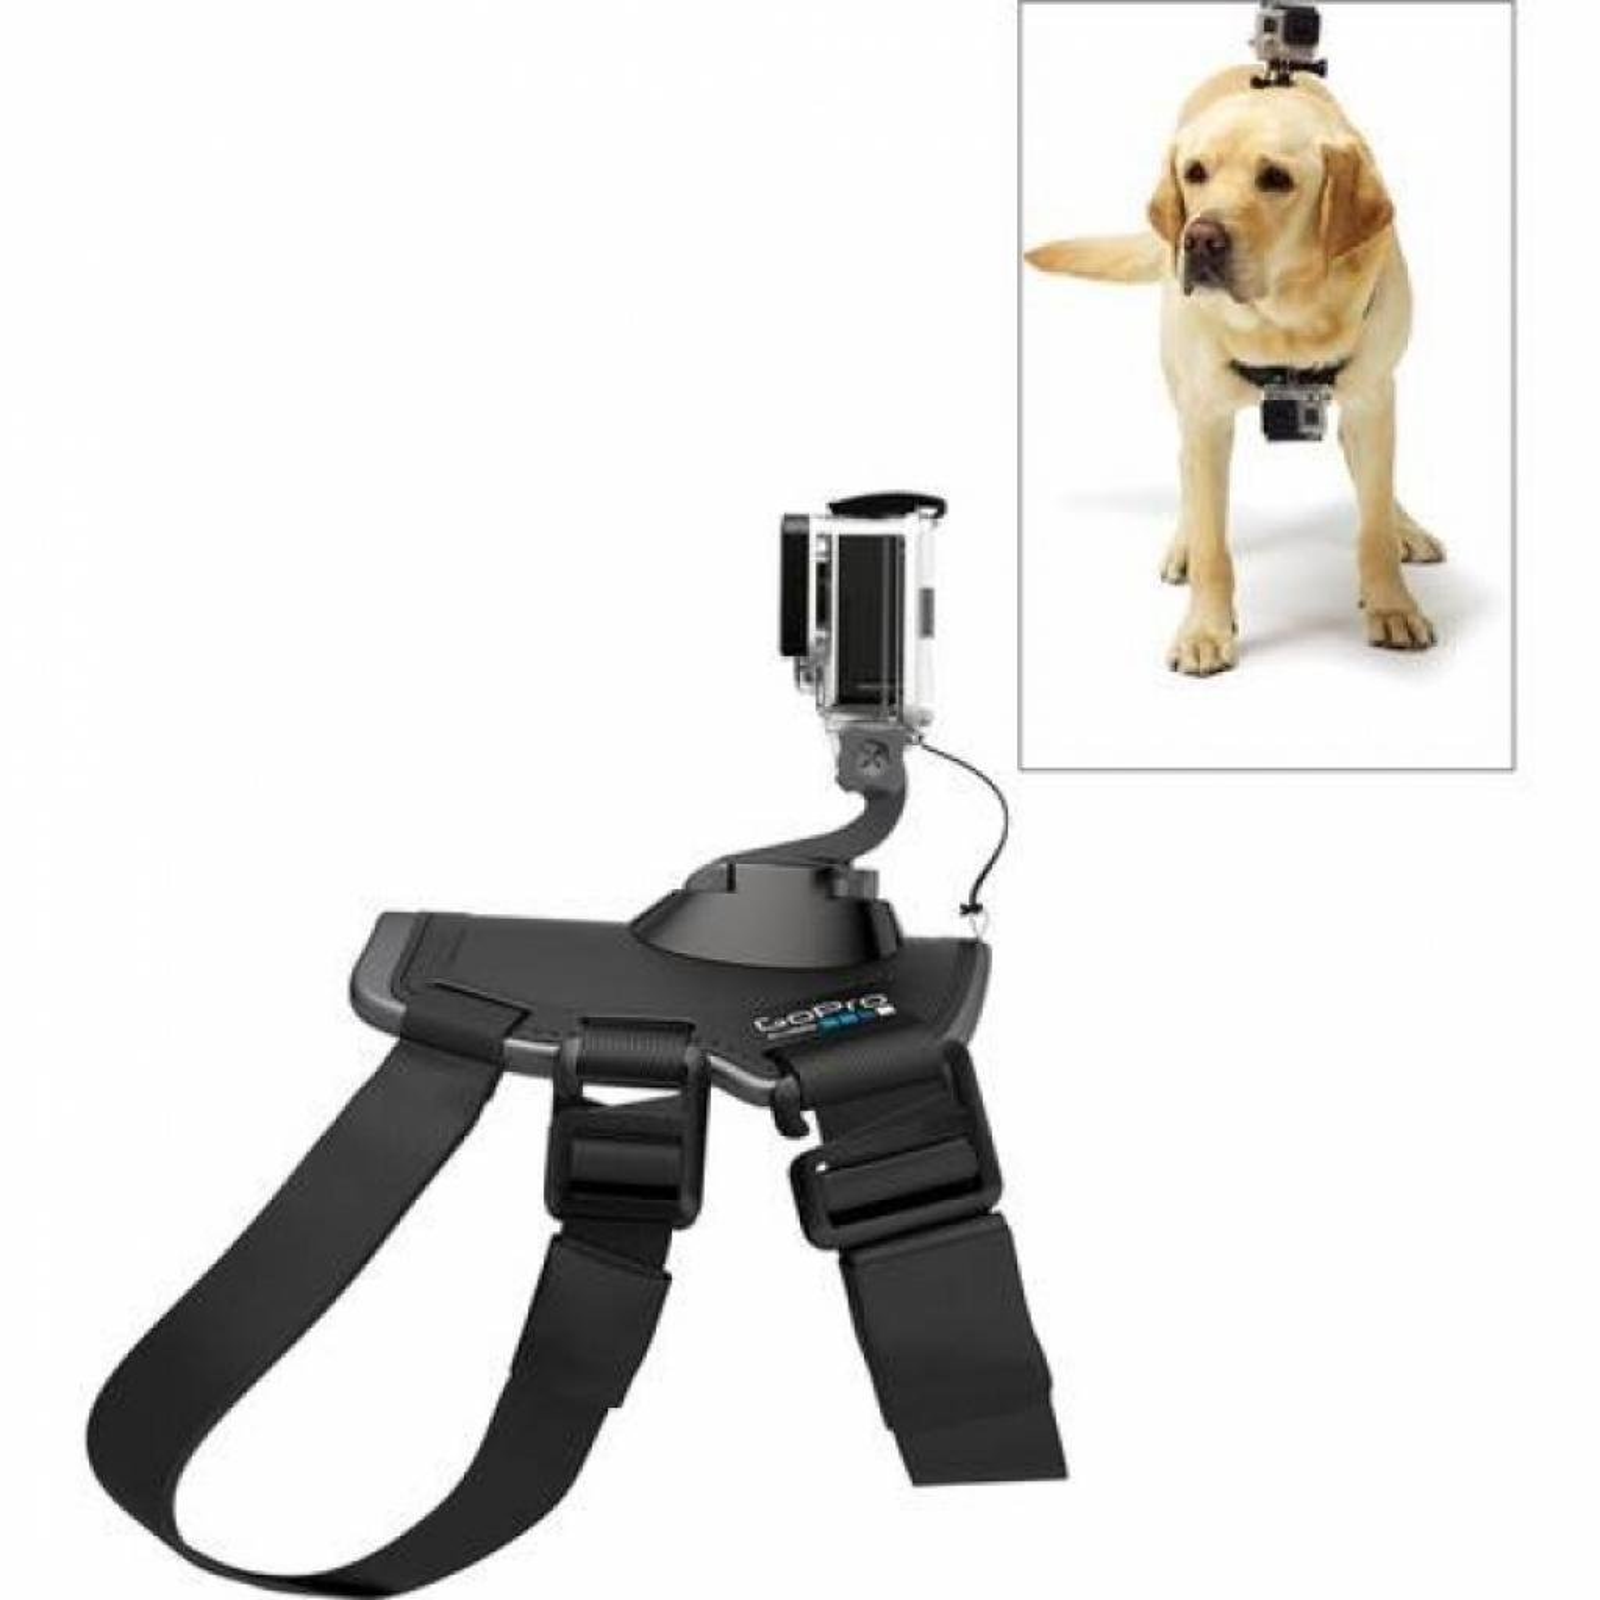 Аксессуар к экшн-камерам GoPro Fetch (ADOGM-001) изображение 3